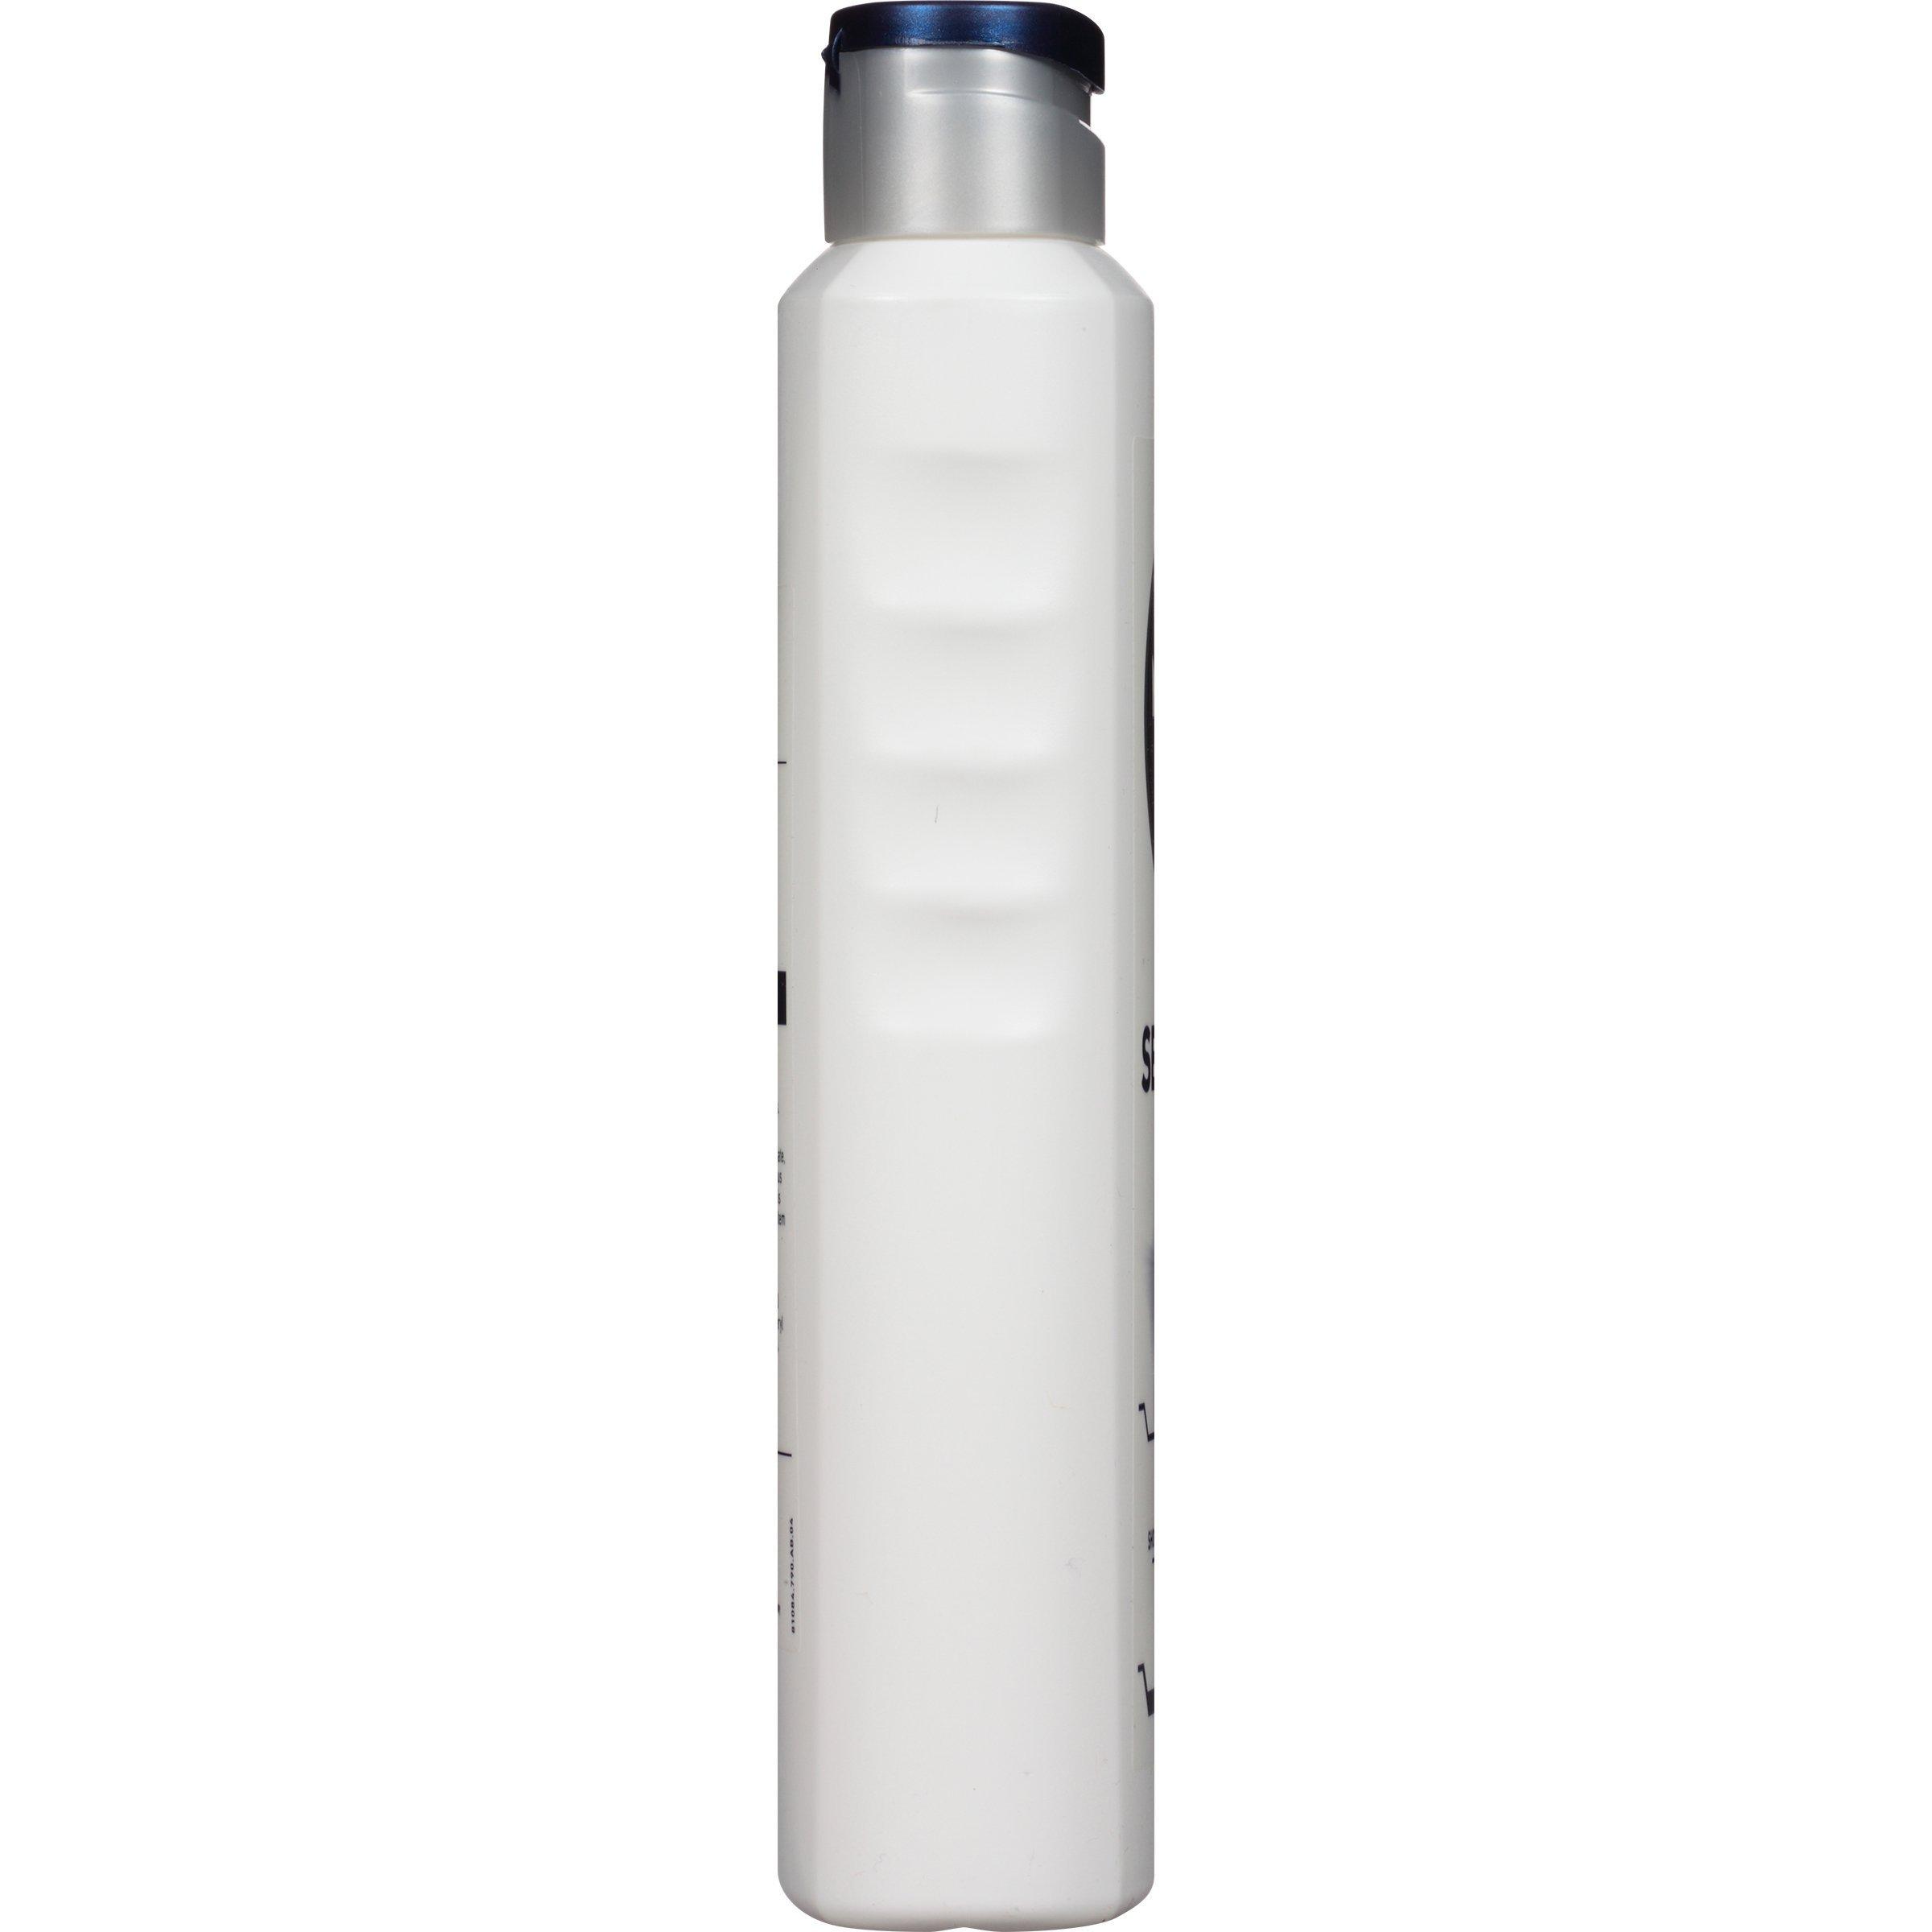 NIVEA Men Sensitive 3-in-1 Body Wash - Shower, Shampoo and Refresh, Soap and Dye-Free For Sensitive Skin - 16.9 fl. oz. (Pack of 3) by Nivea Men (Image #3)